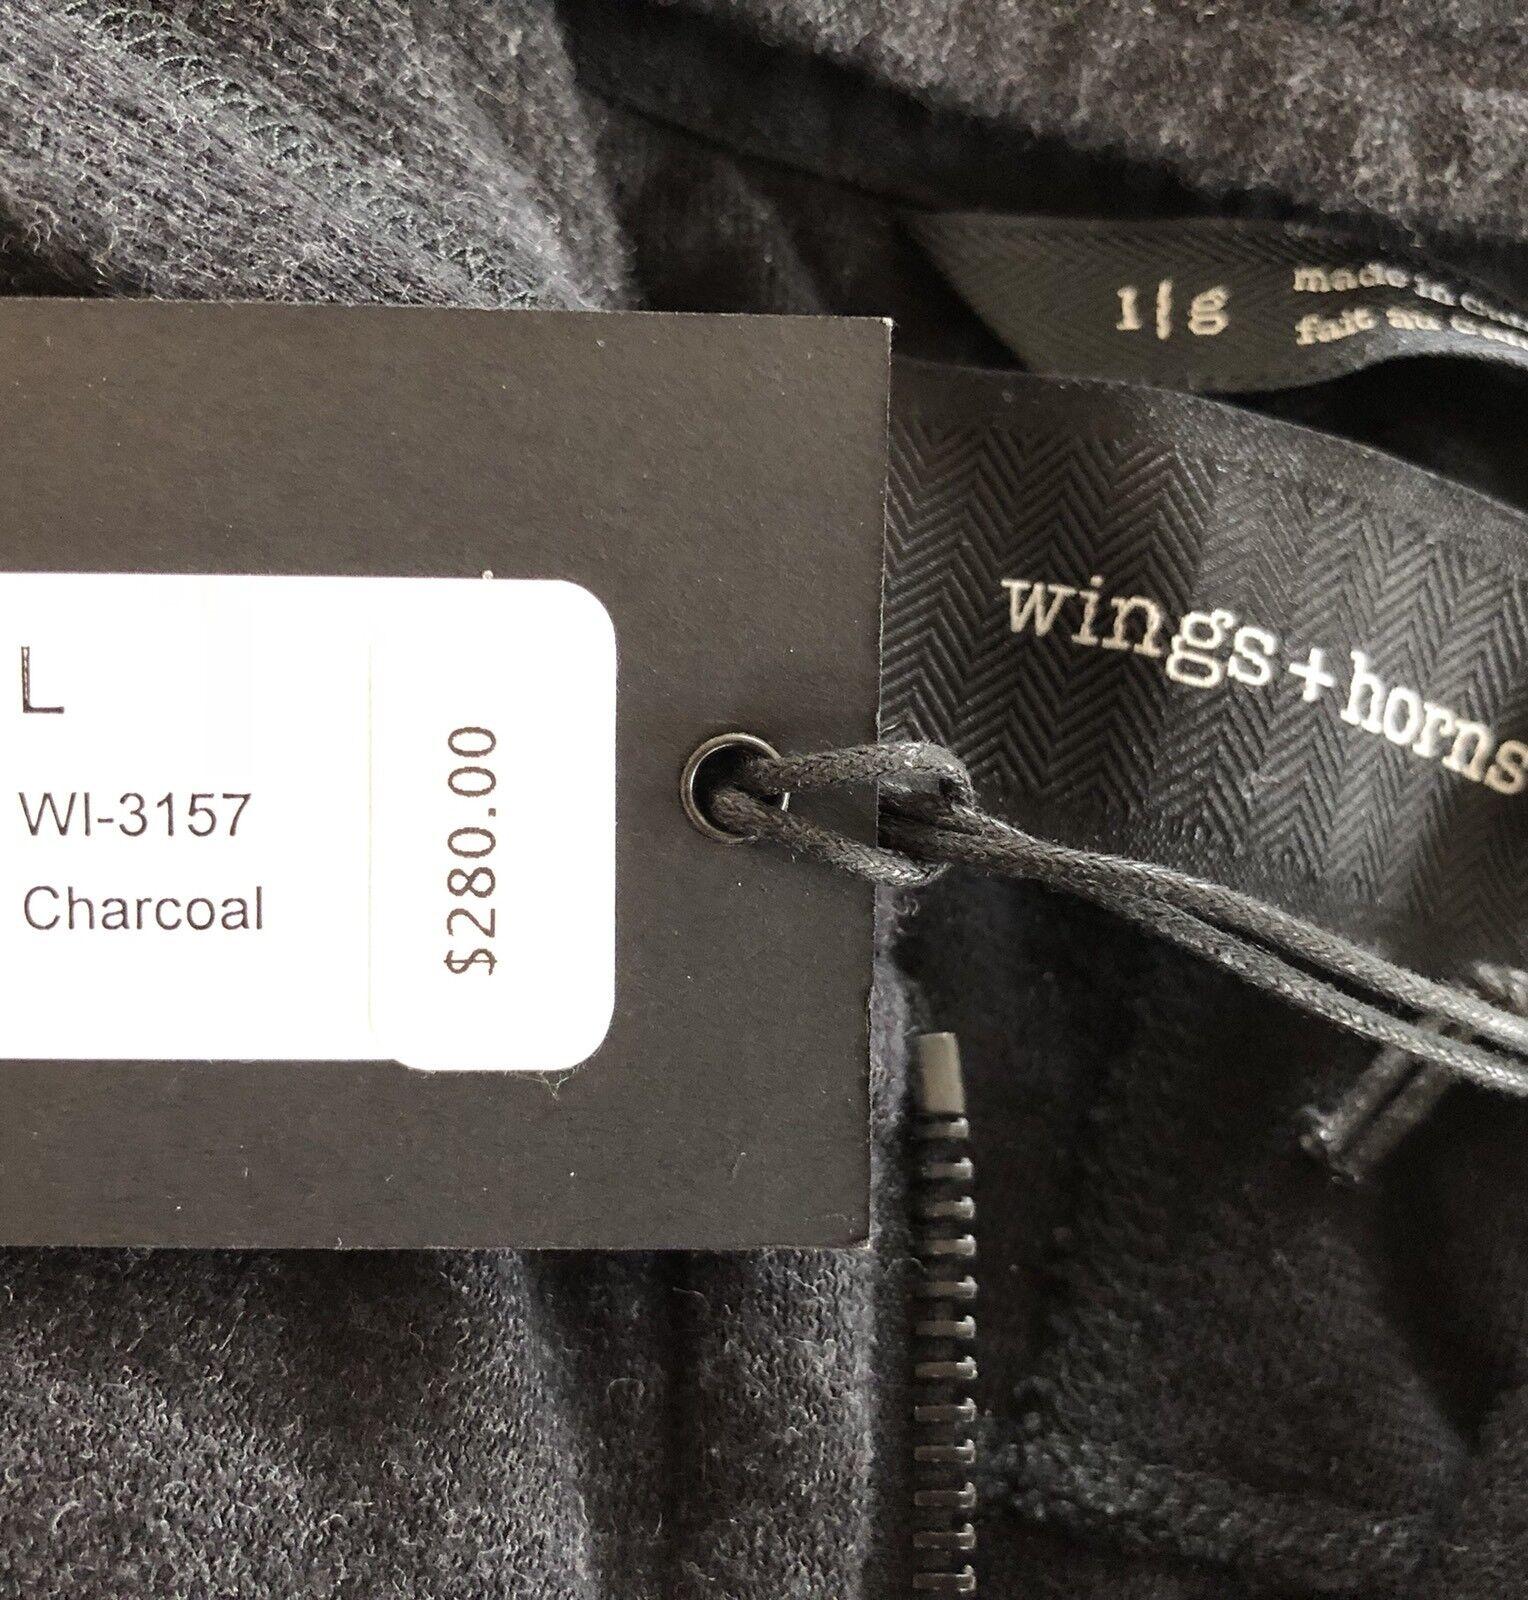 Wings + Horns hoody (sweatjacke) Double Knit Lounge Lounge Lounge talla L (wi-3157-cha) 9f43a1